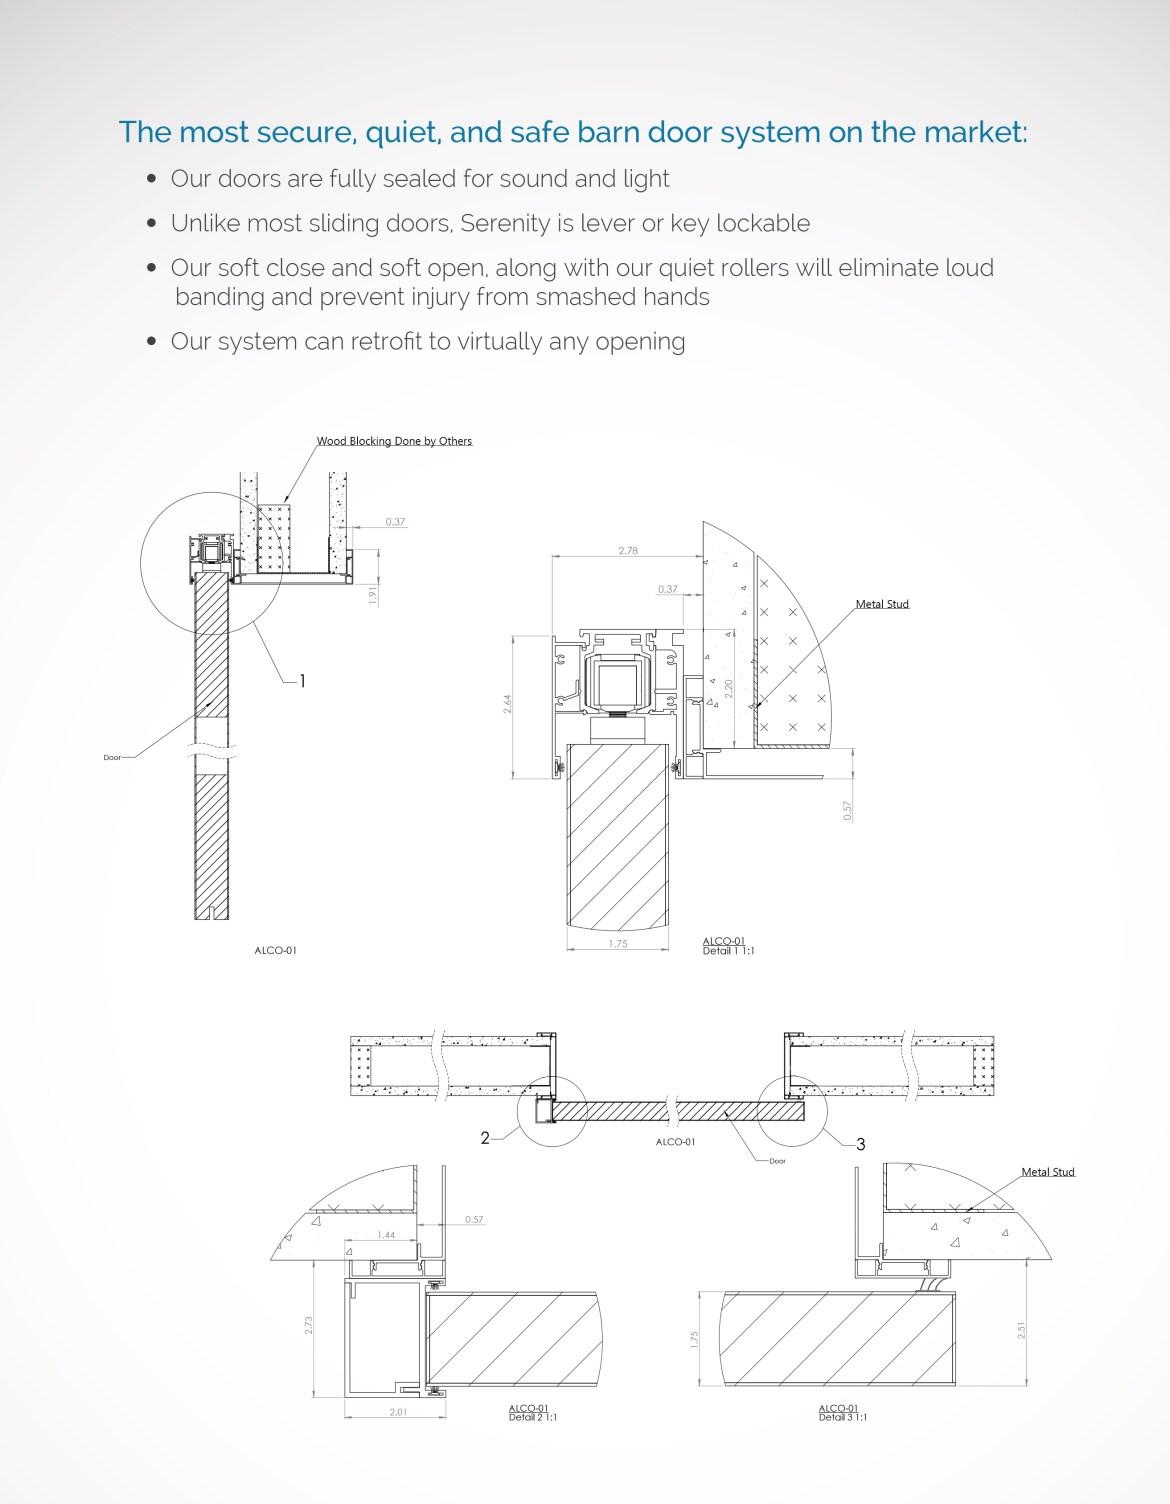 sliding-barn-door-systems-colorado springs, co_Serenity Sliding Door Systems